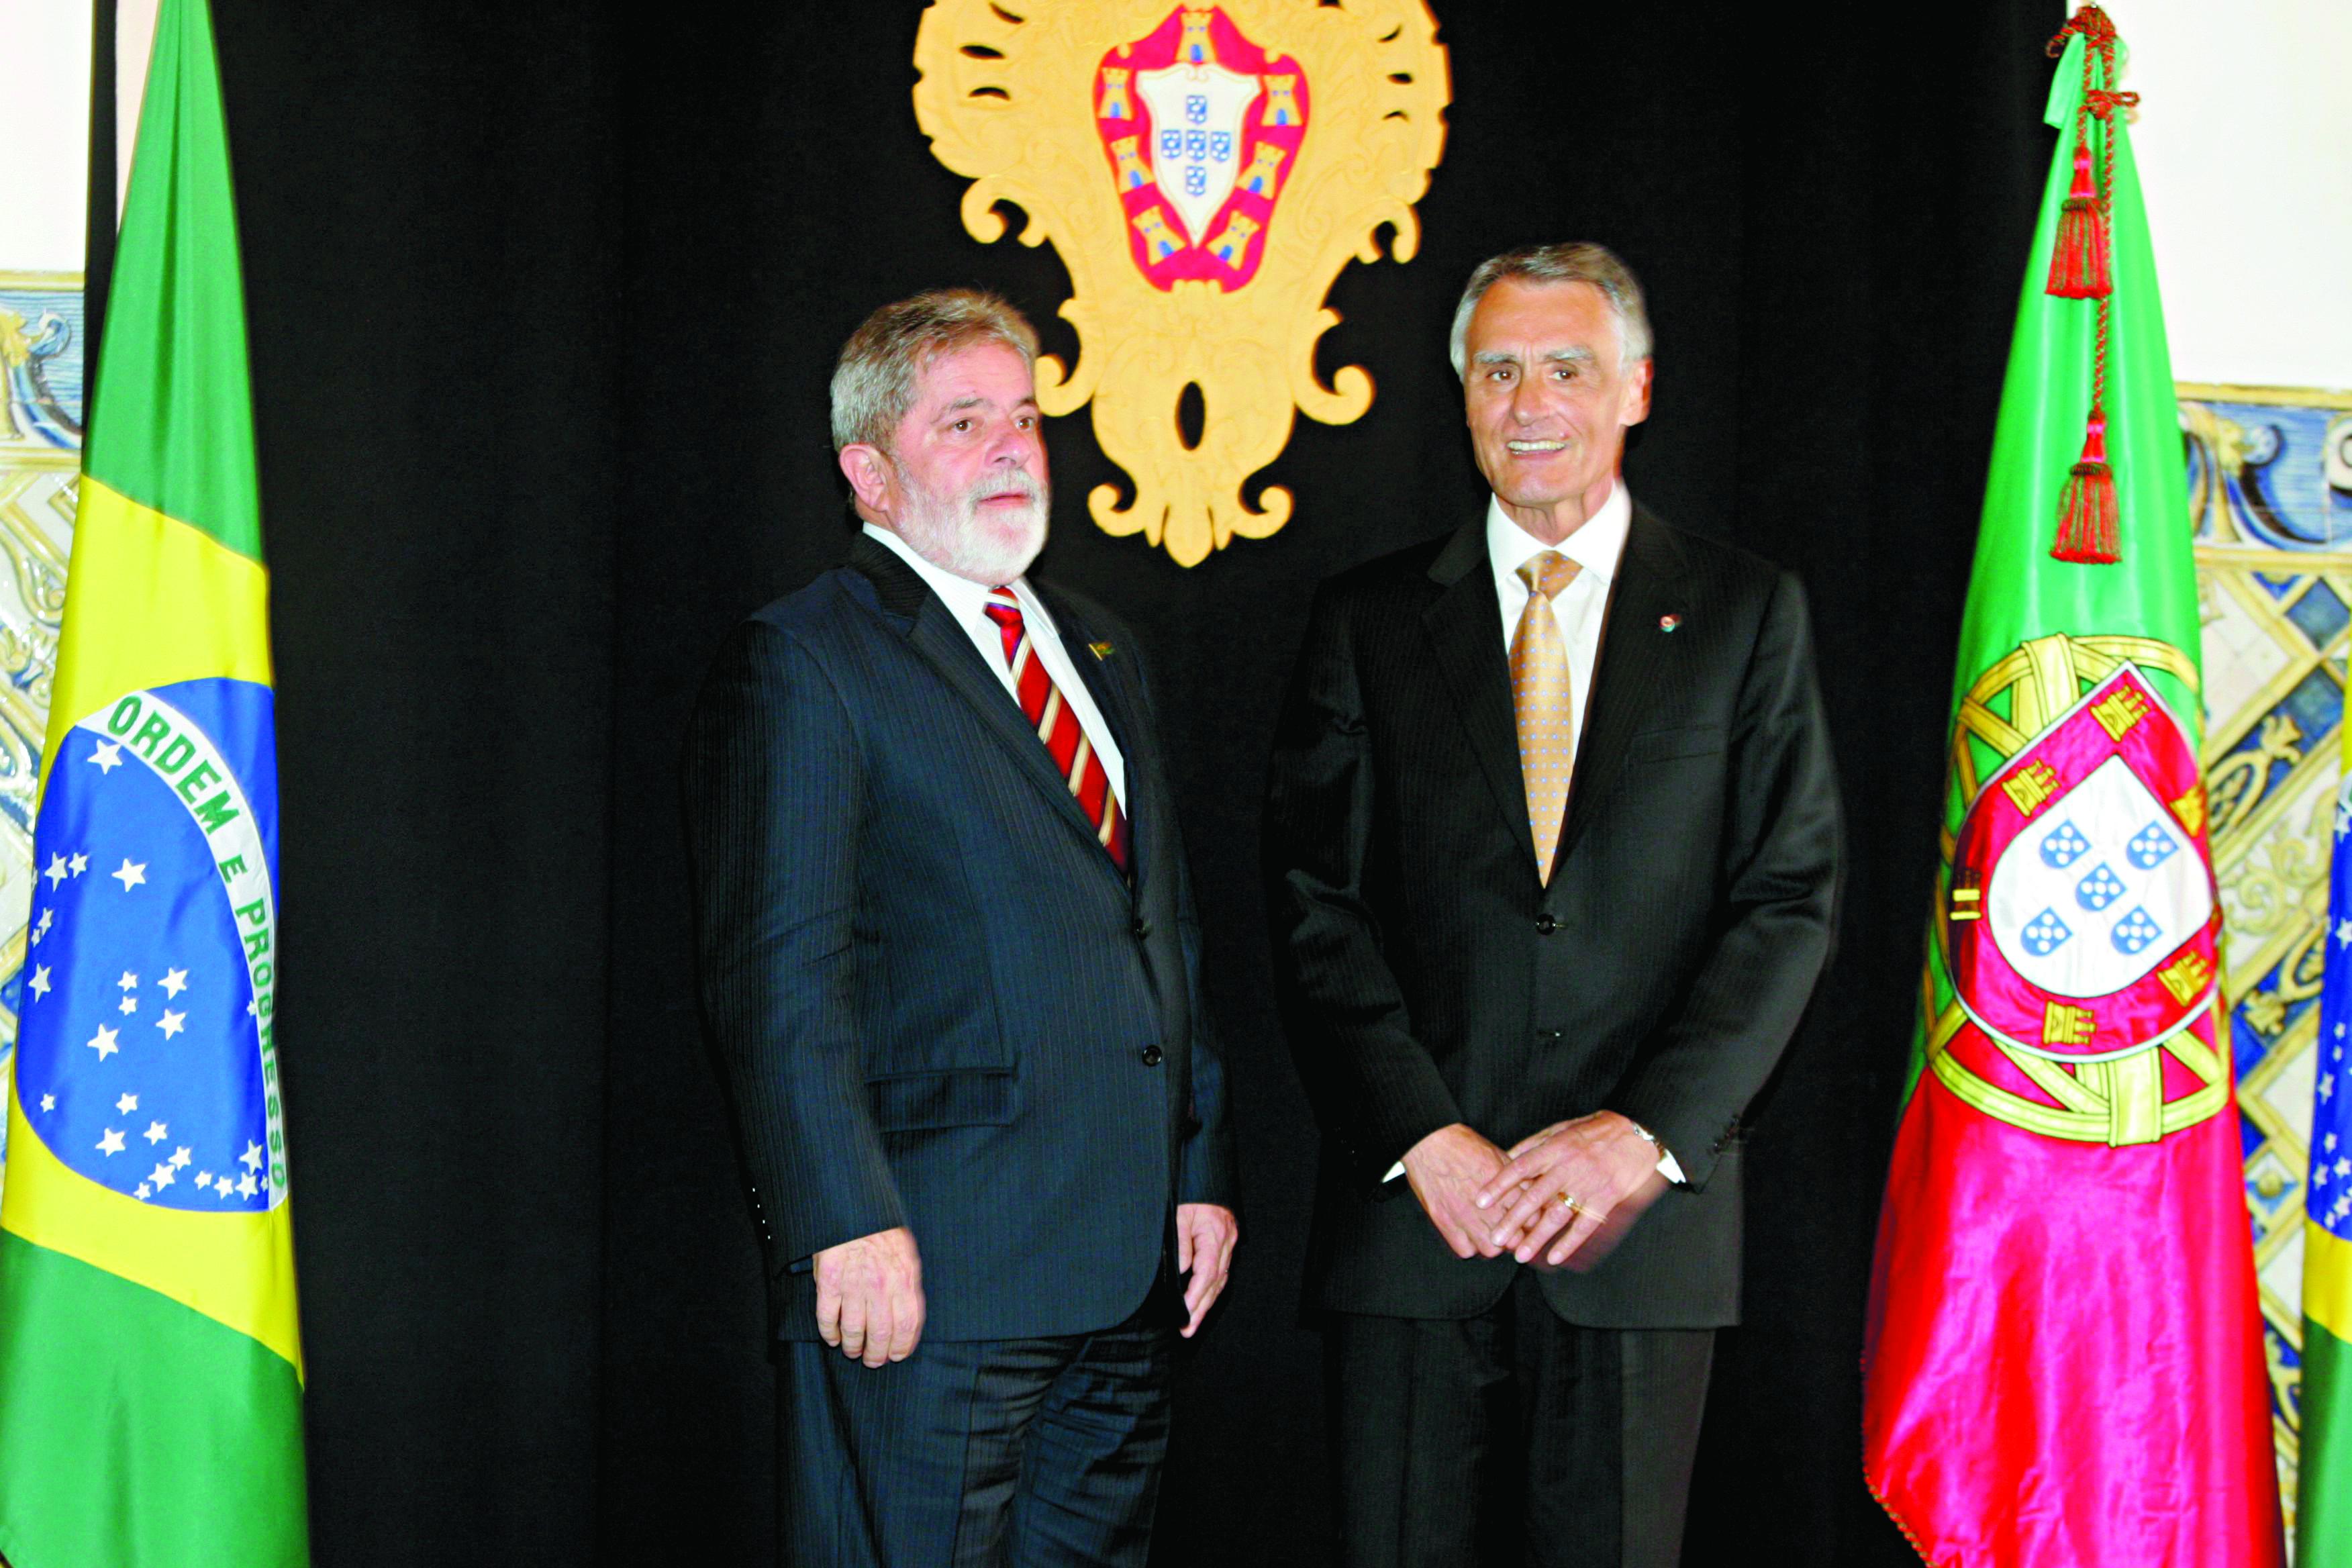 Tribunal nega último pedido de habeas corpus de Lula